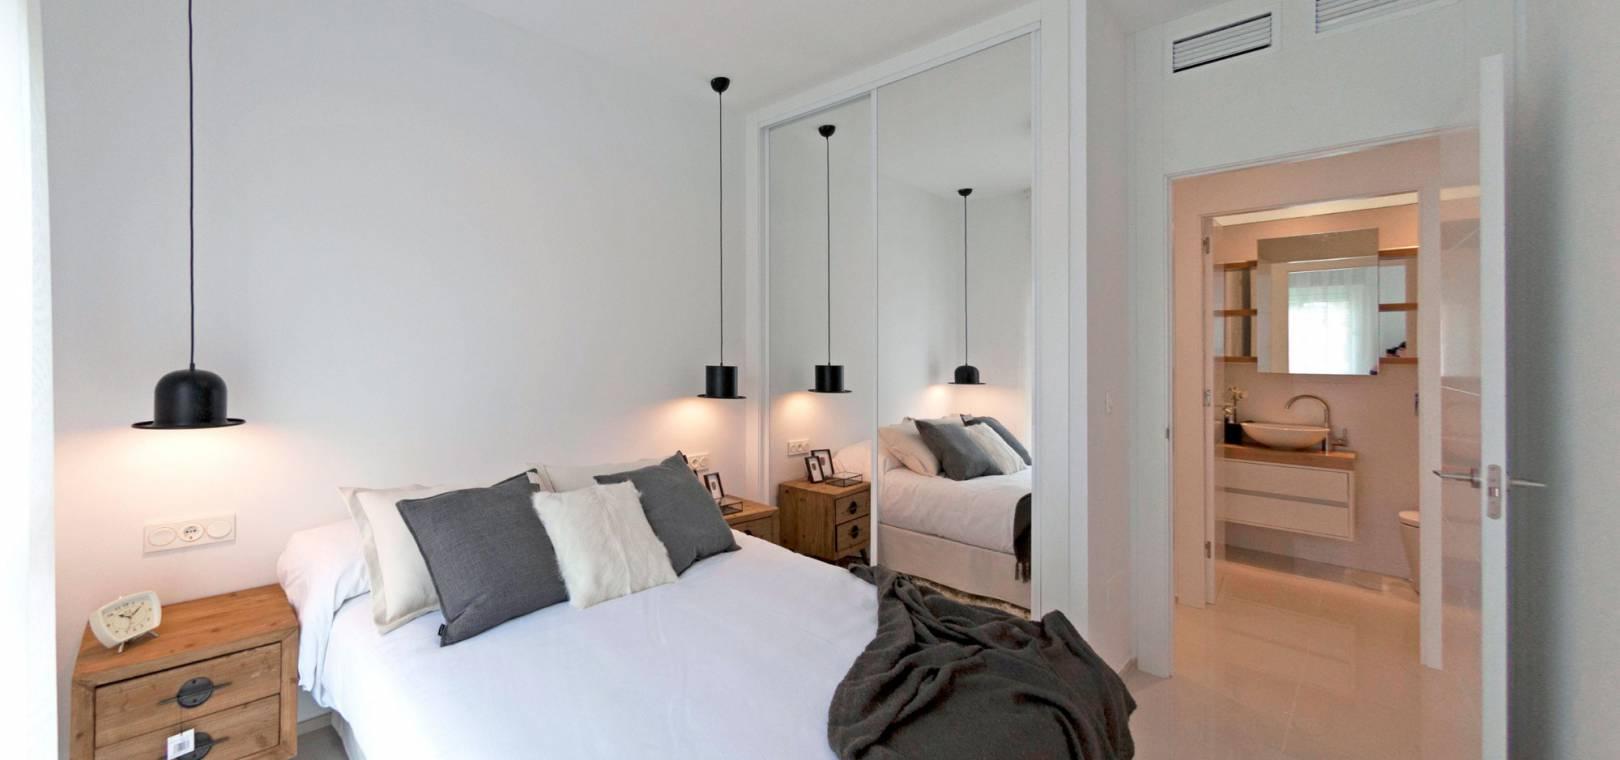 Nybyggnad - Lägenhet - Ciudad Quesada - Dona Pepa